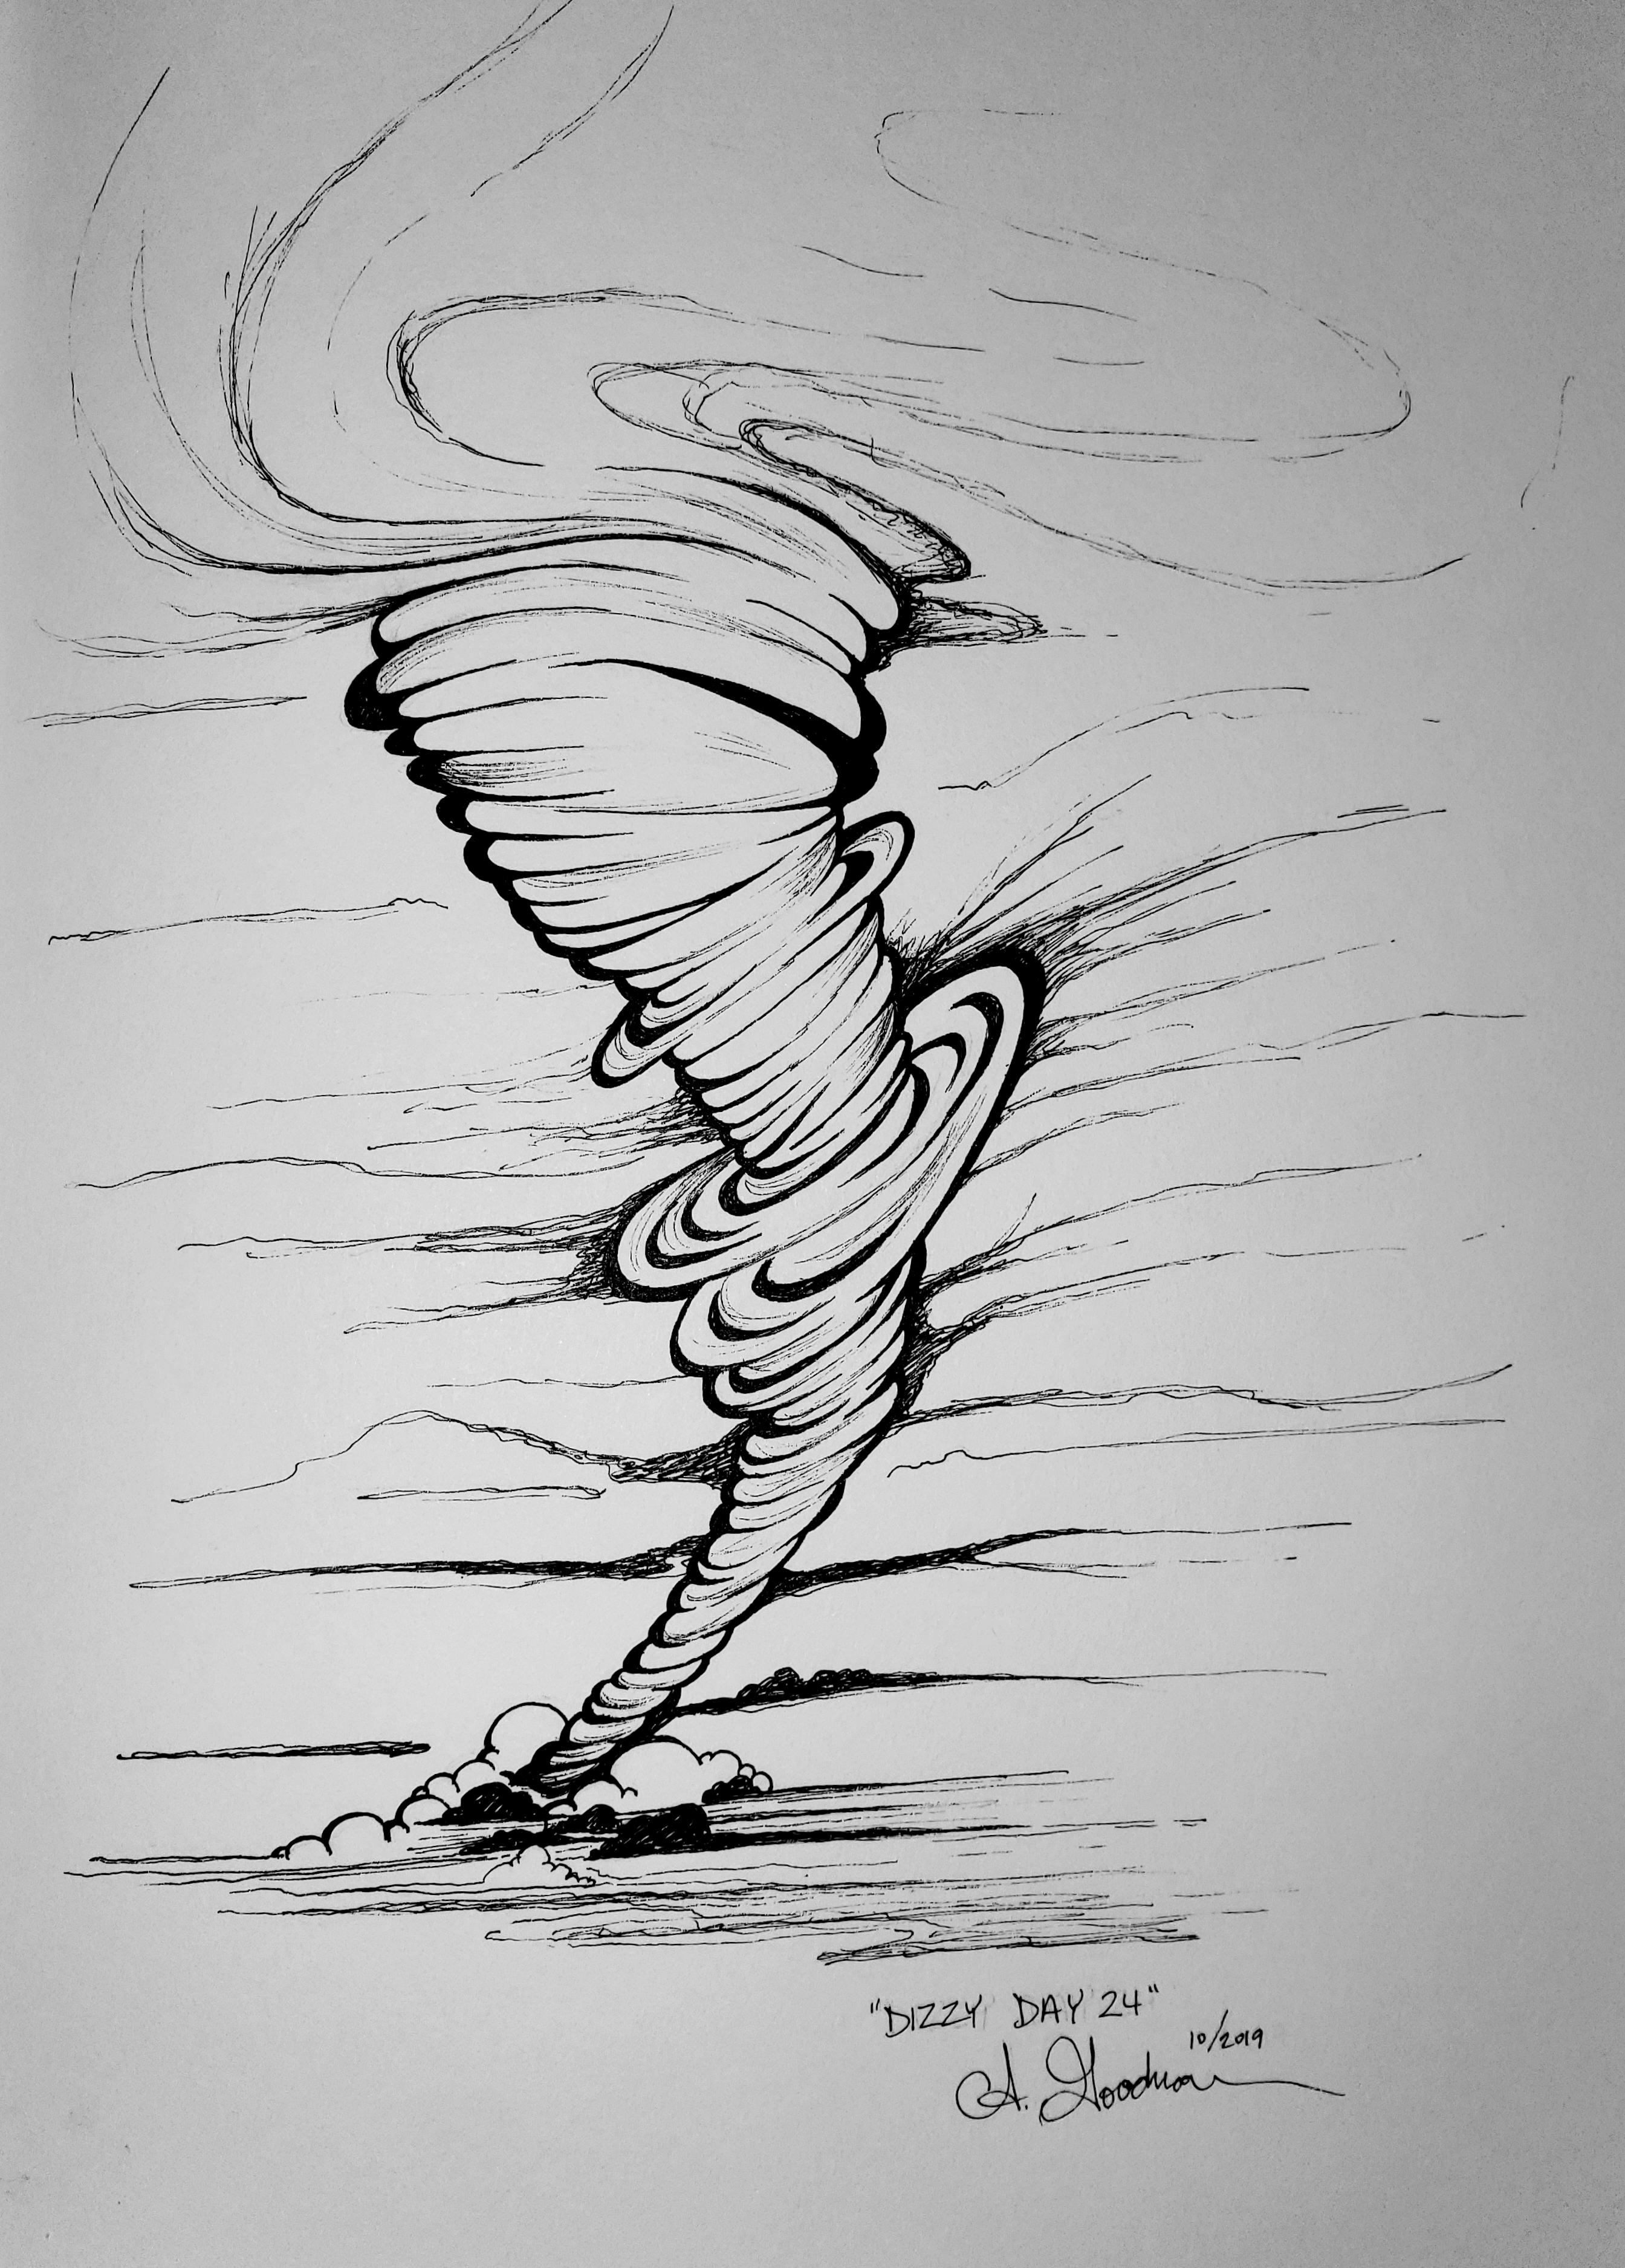 Ink drawing of Dizzy Tornado by Alecia Goodman